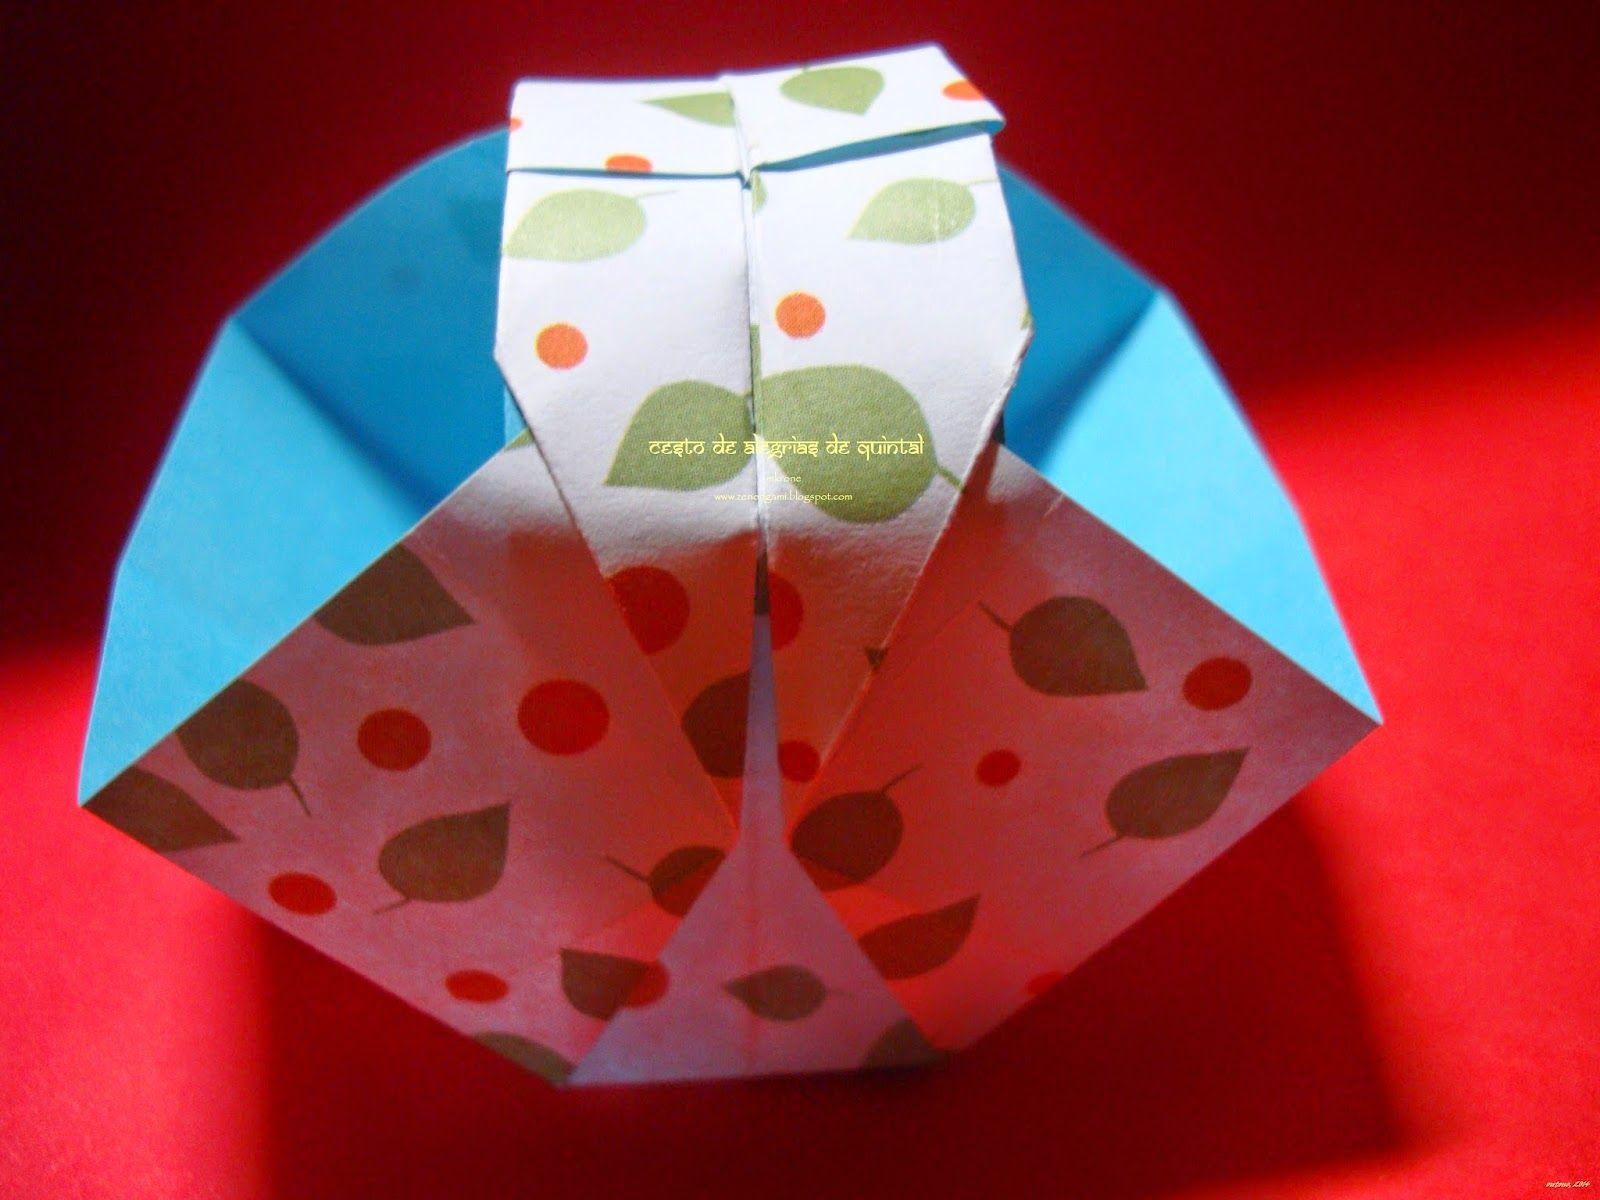 Zen Origami Cesto De Alegrias De Quintal Caixa De Origami Origami Cestas